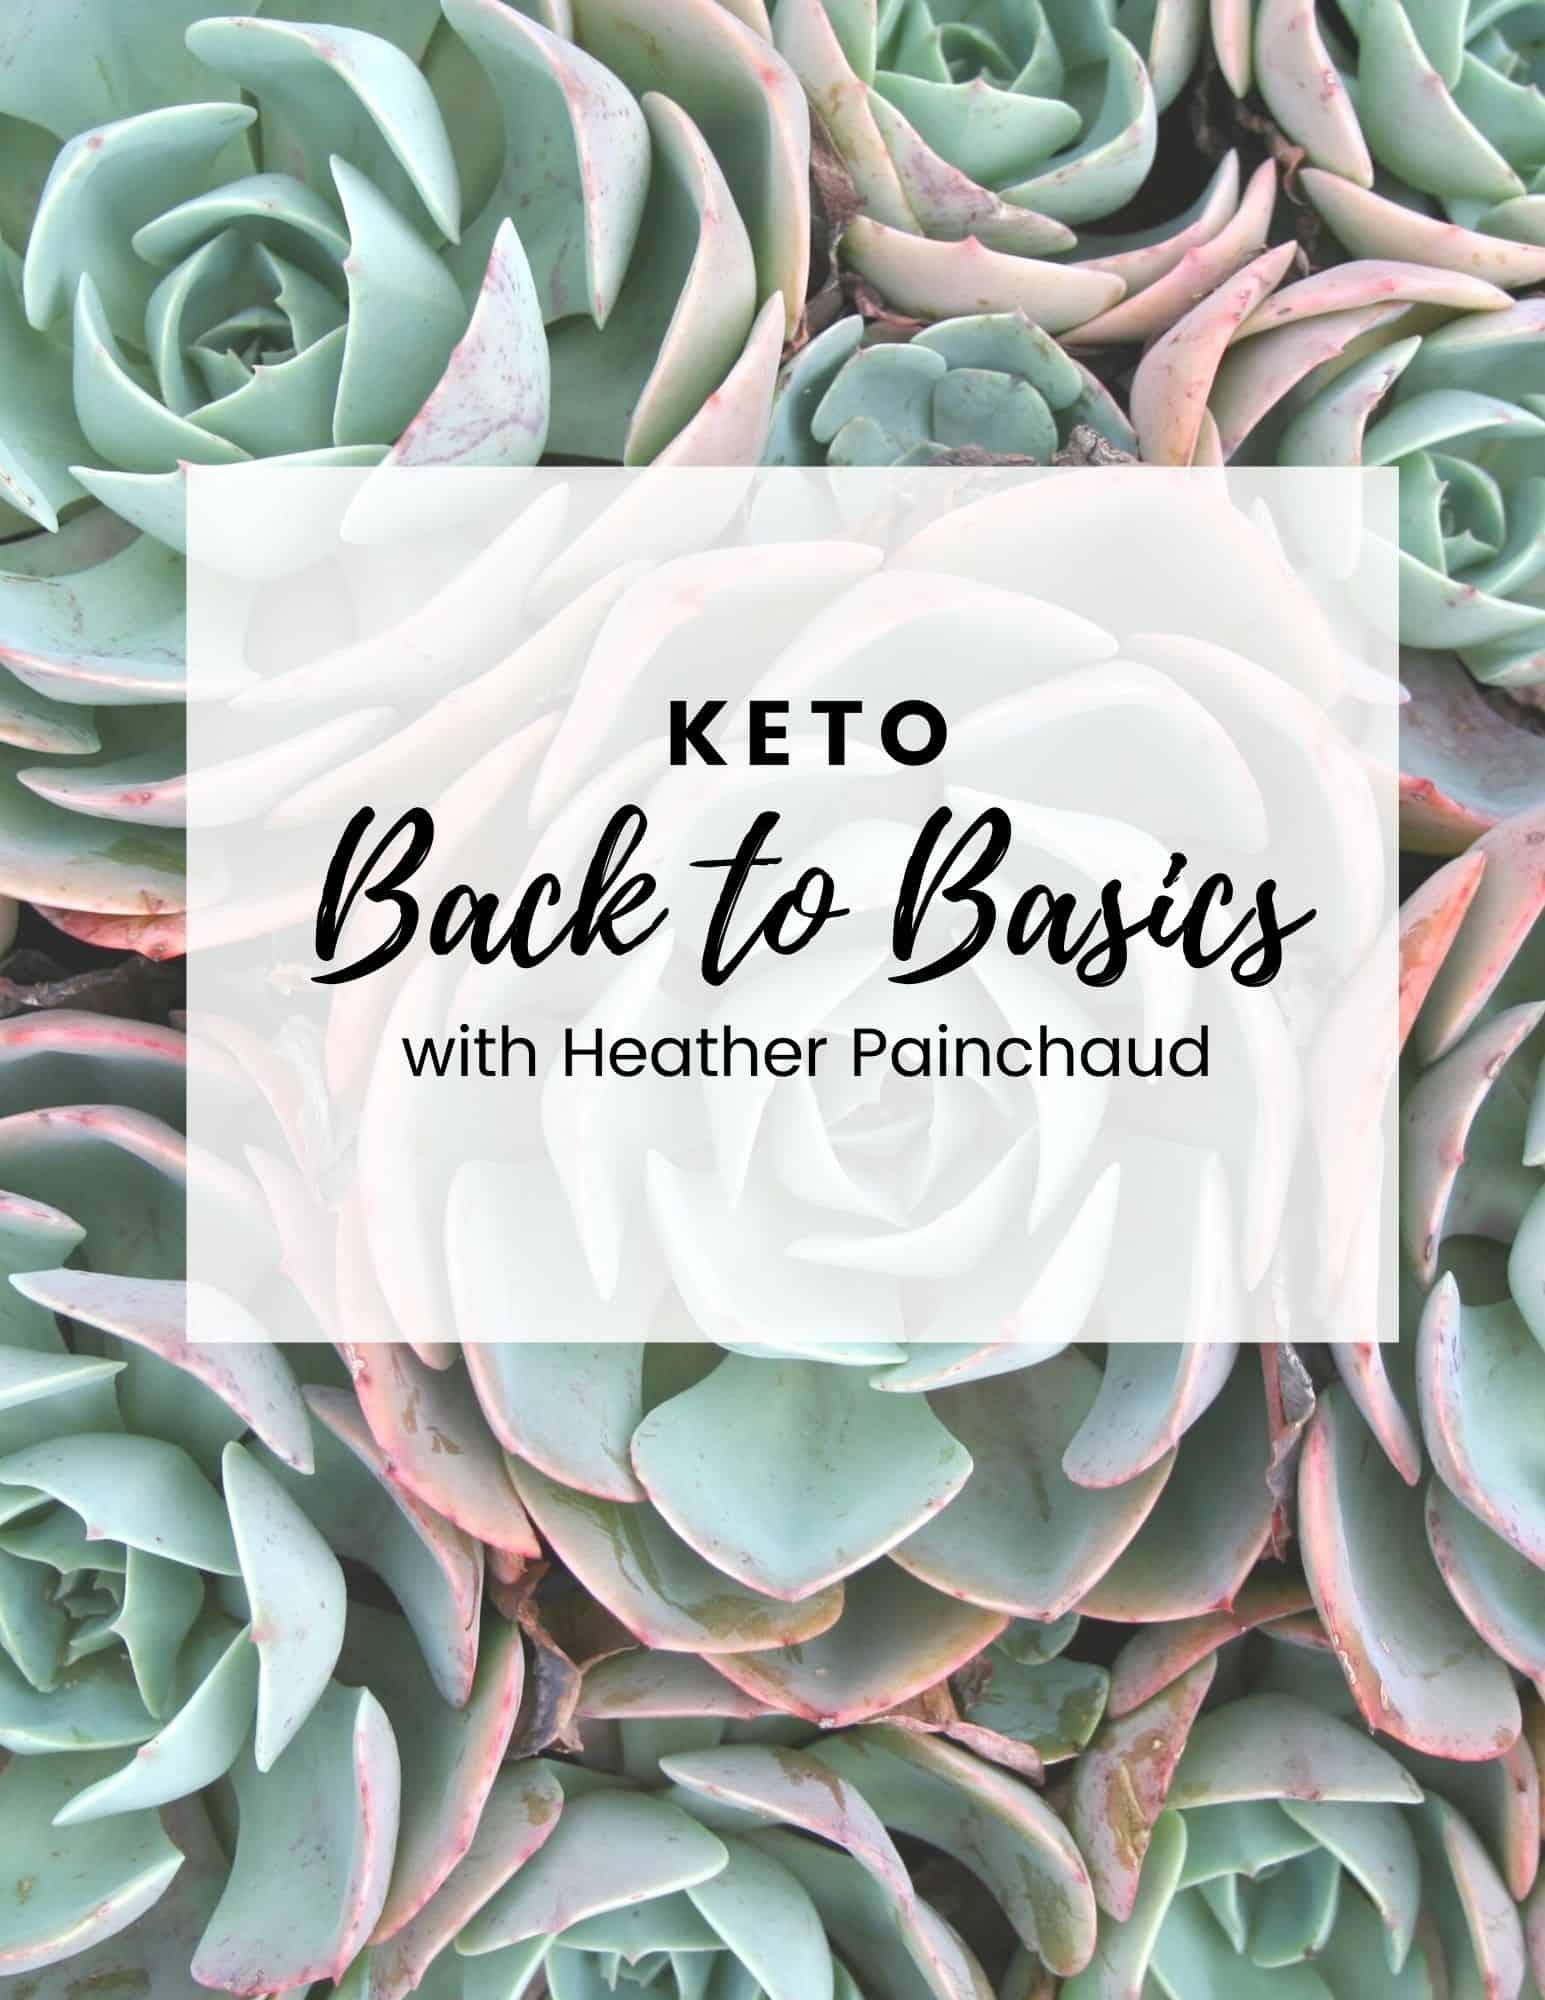 keto back to basics workbook title